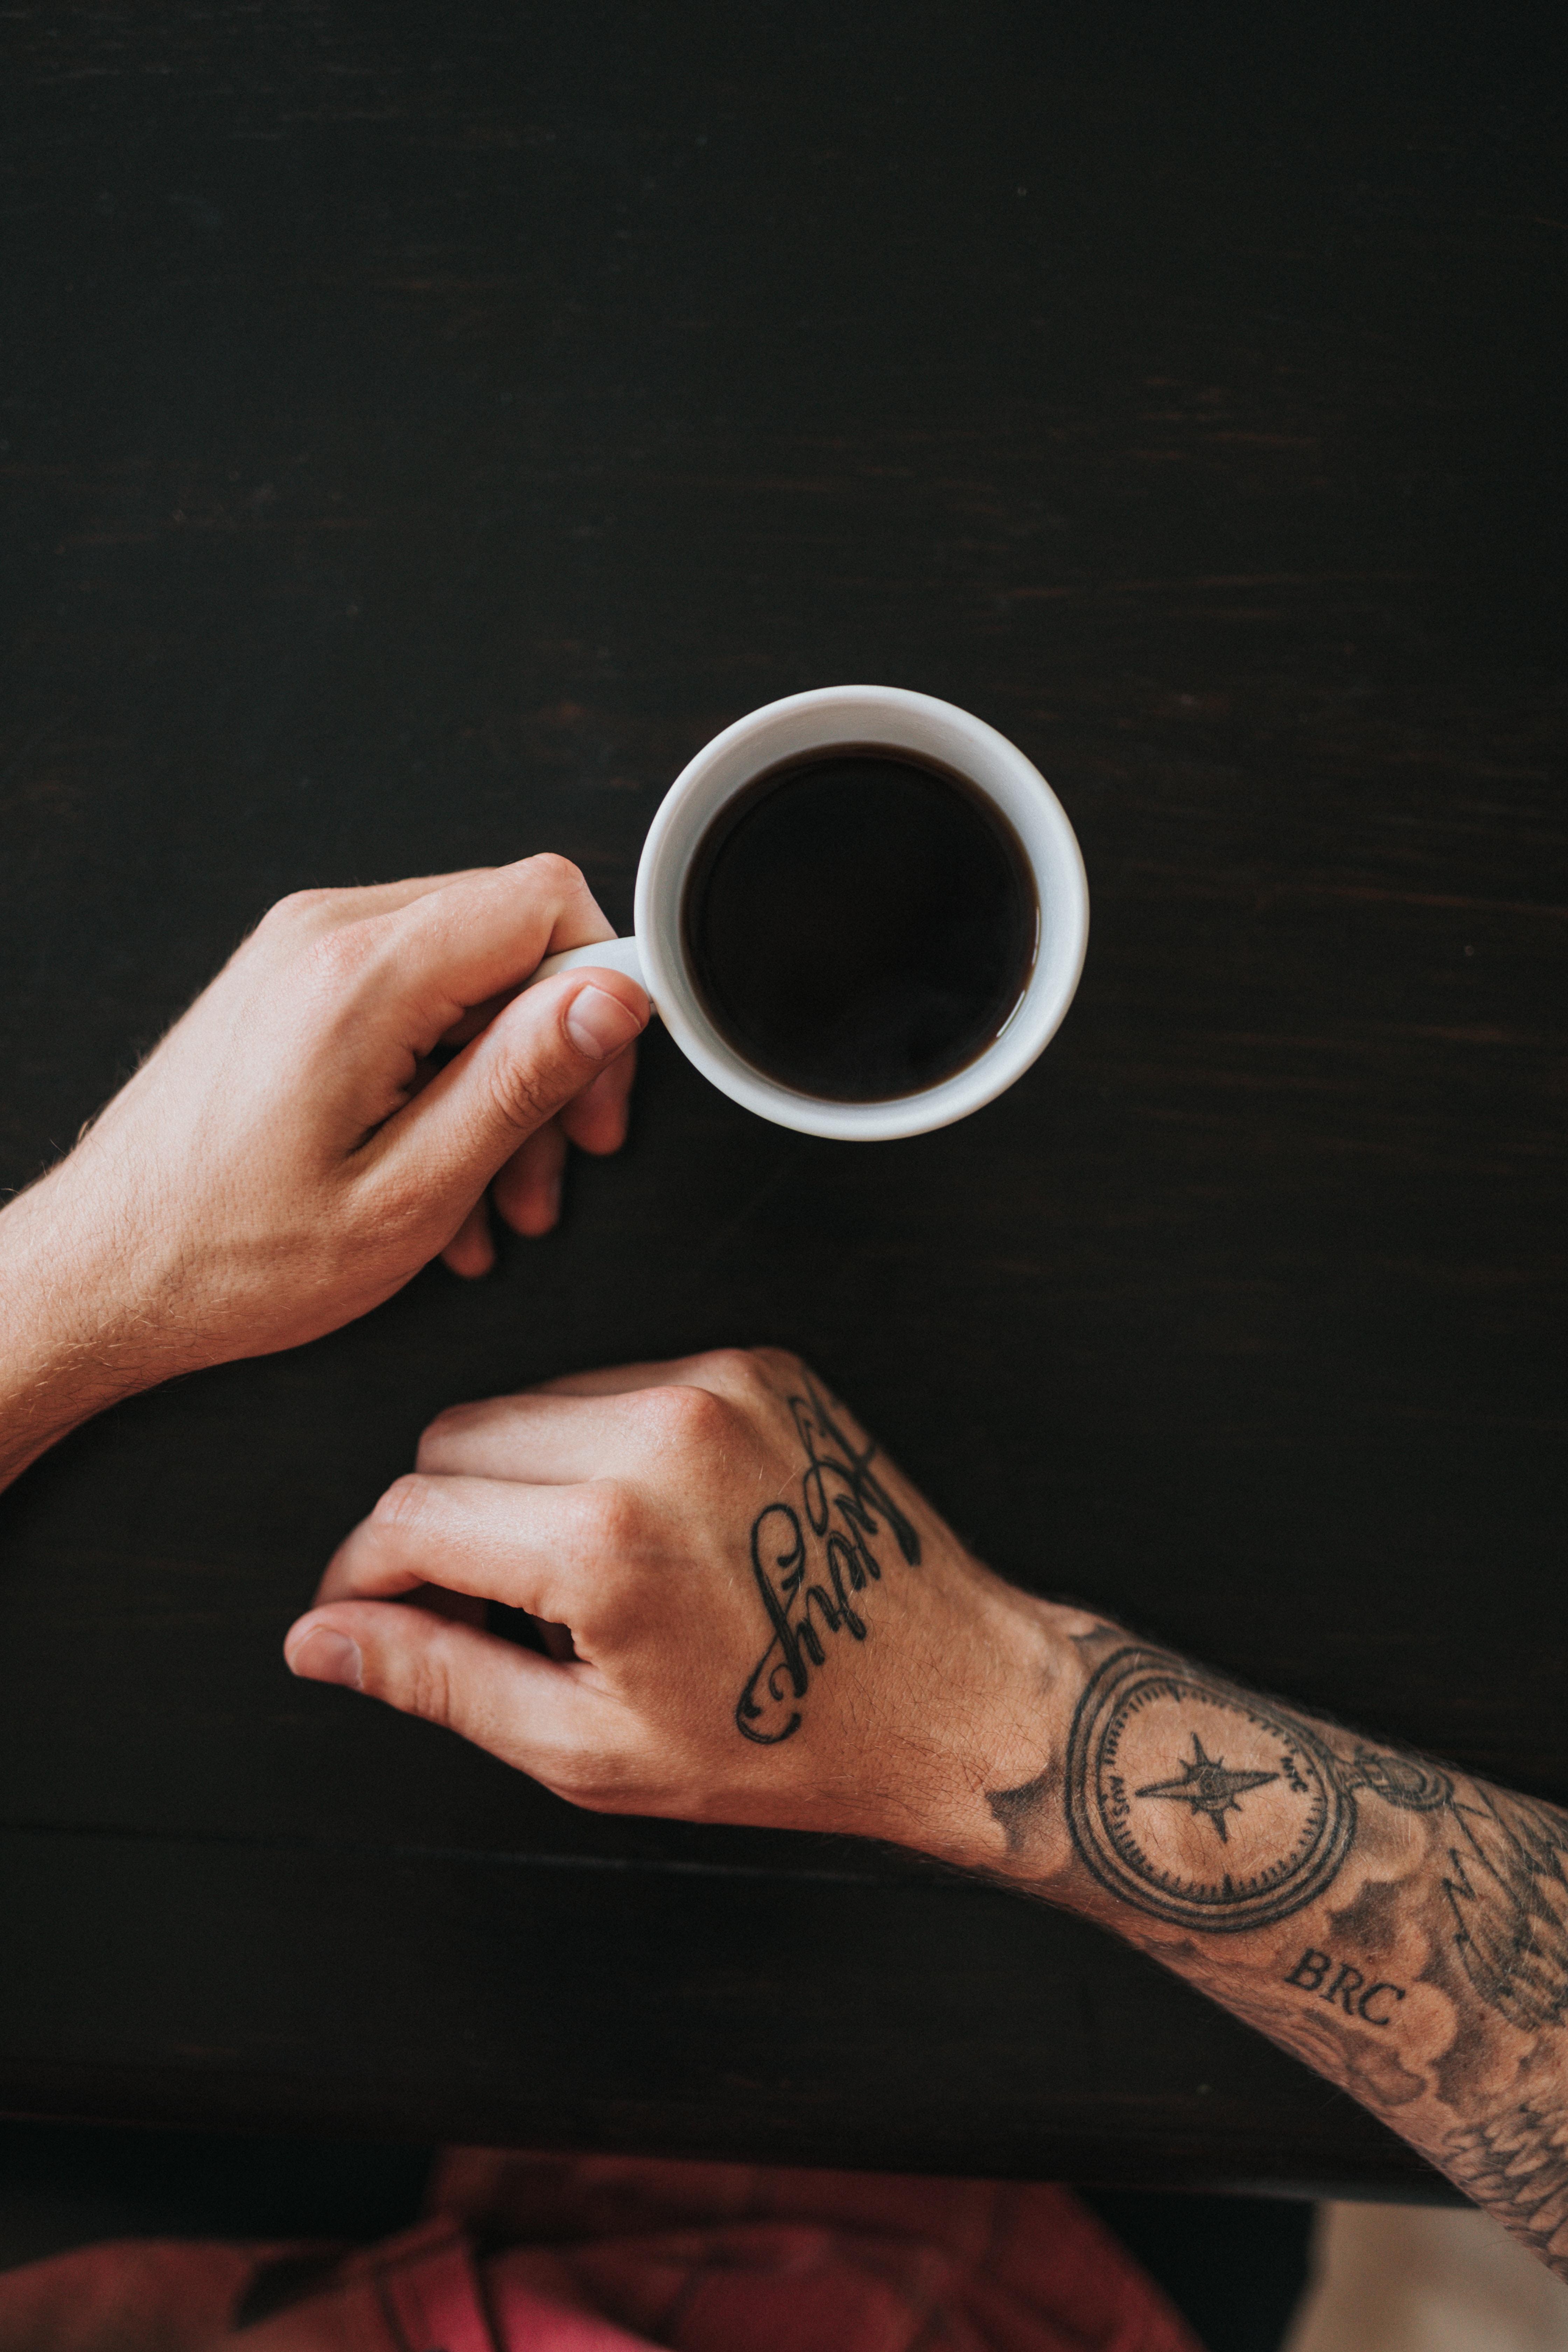 person holding white mug